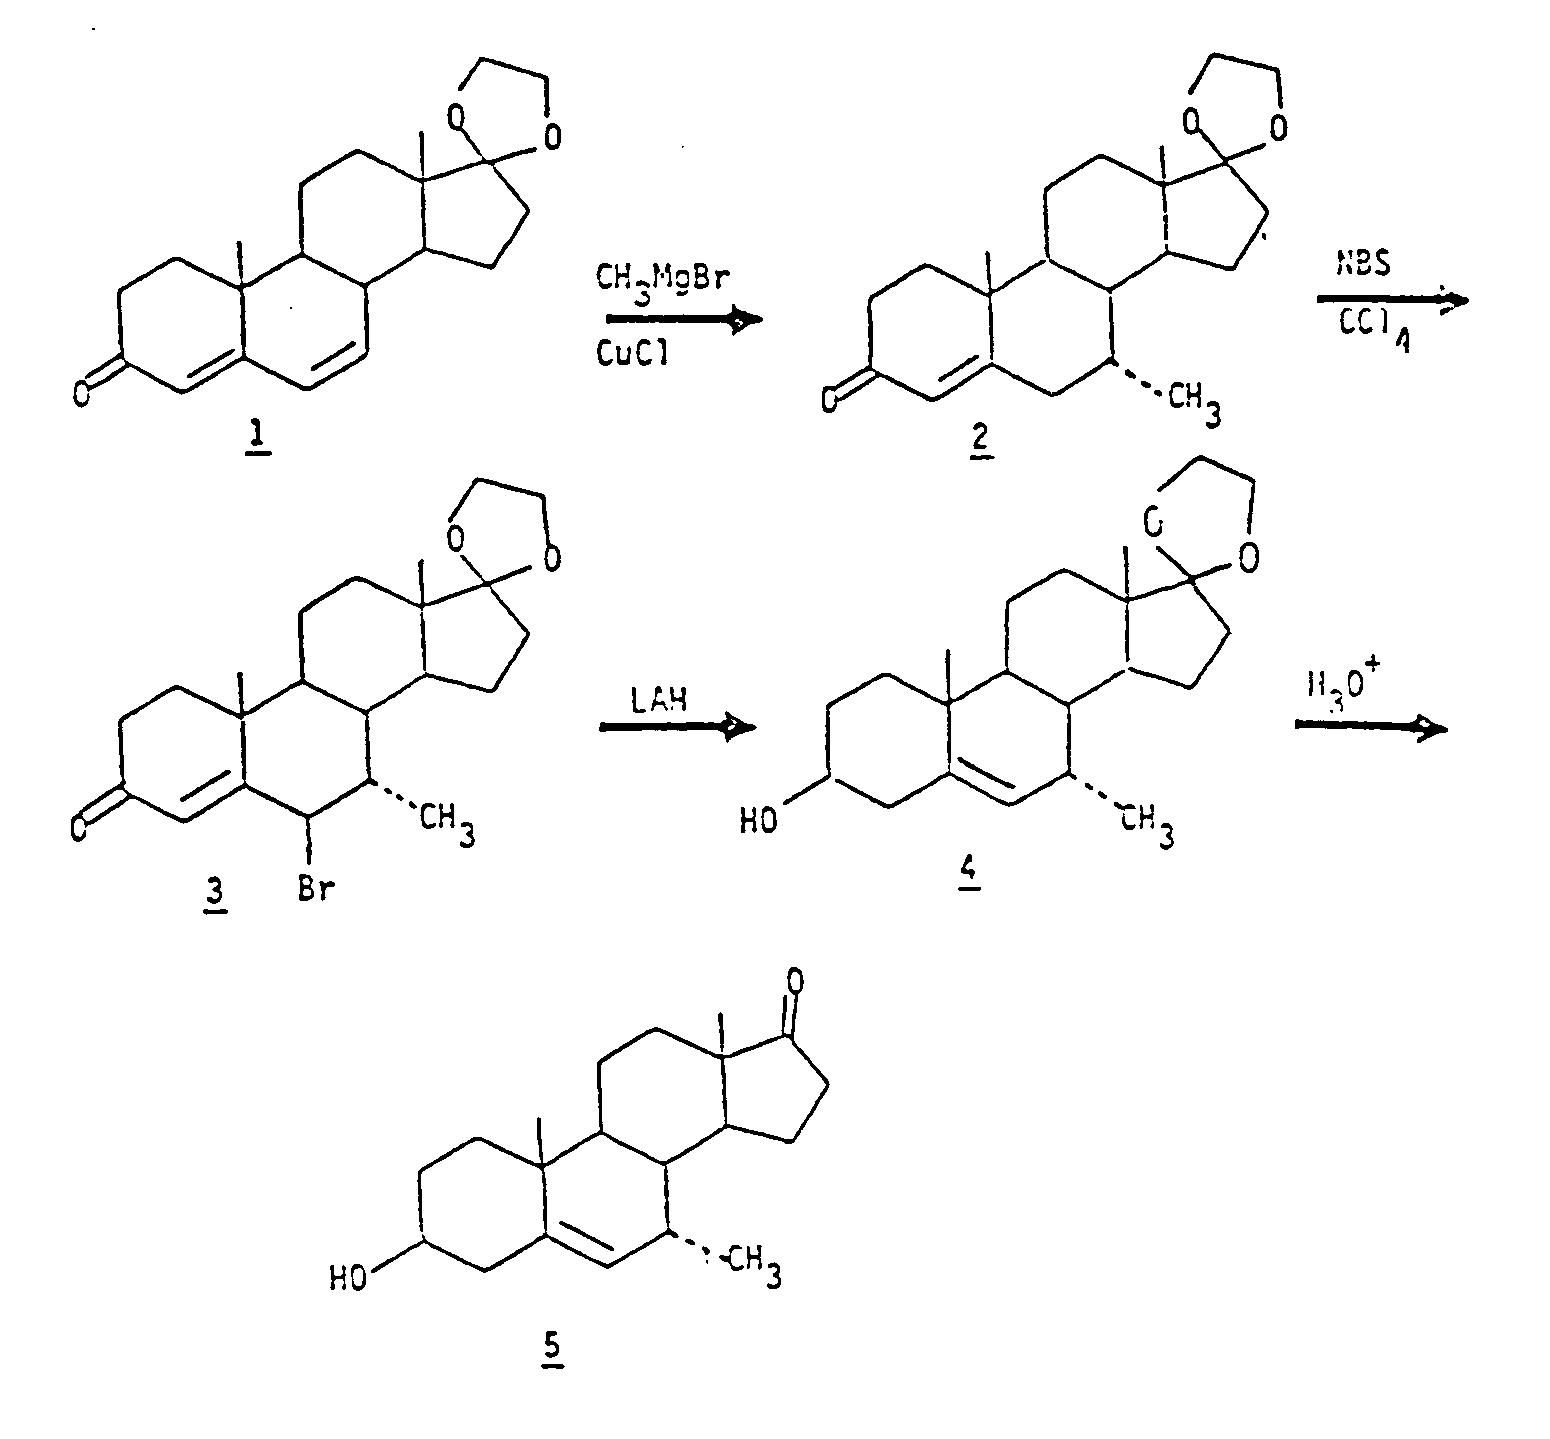 6-methylene steroids